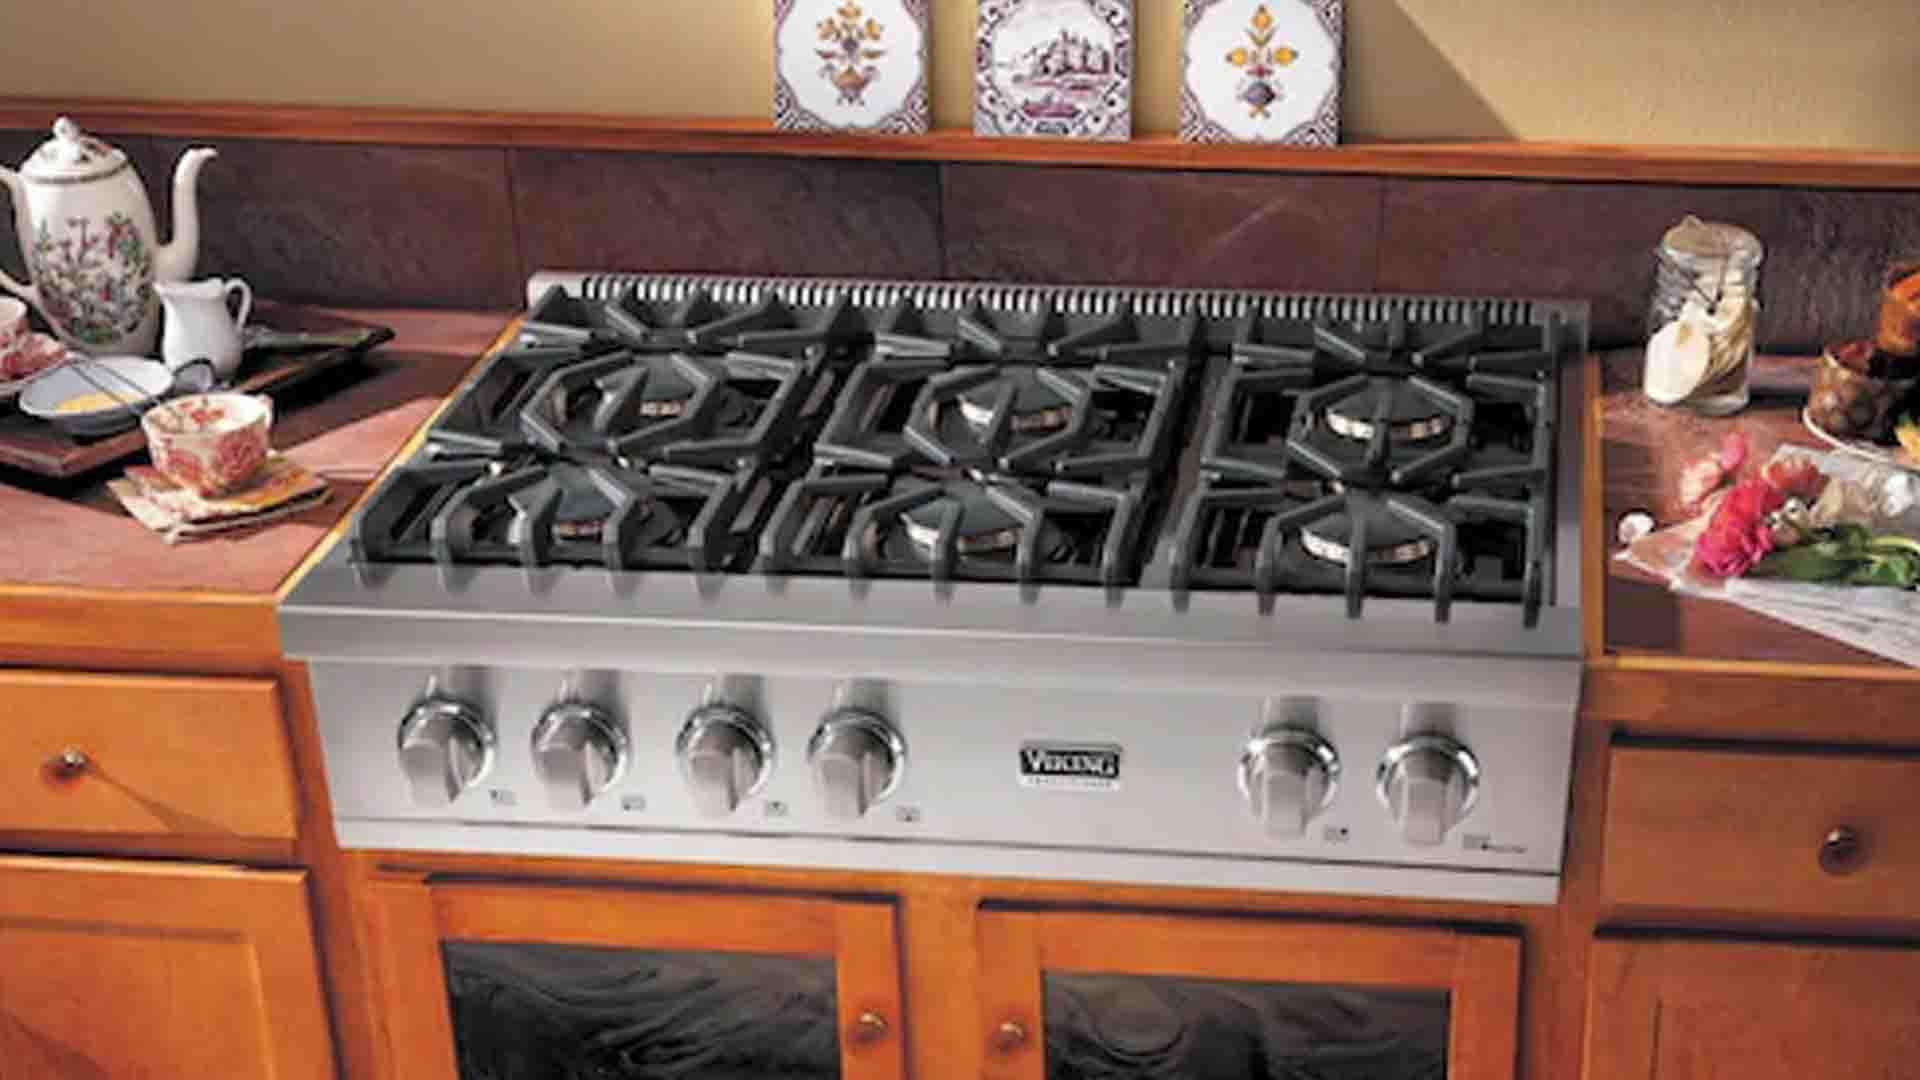 Viking Rangetops Repair Service   Viking Appliance Repairs